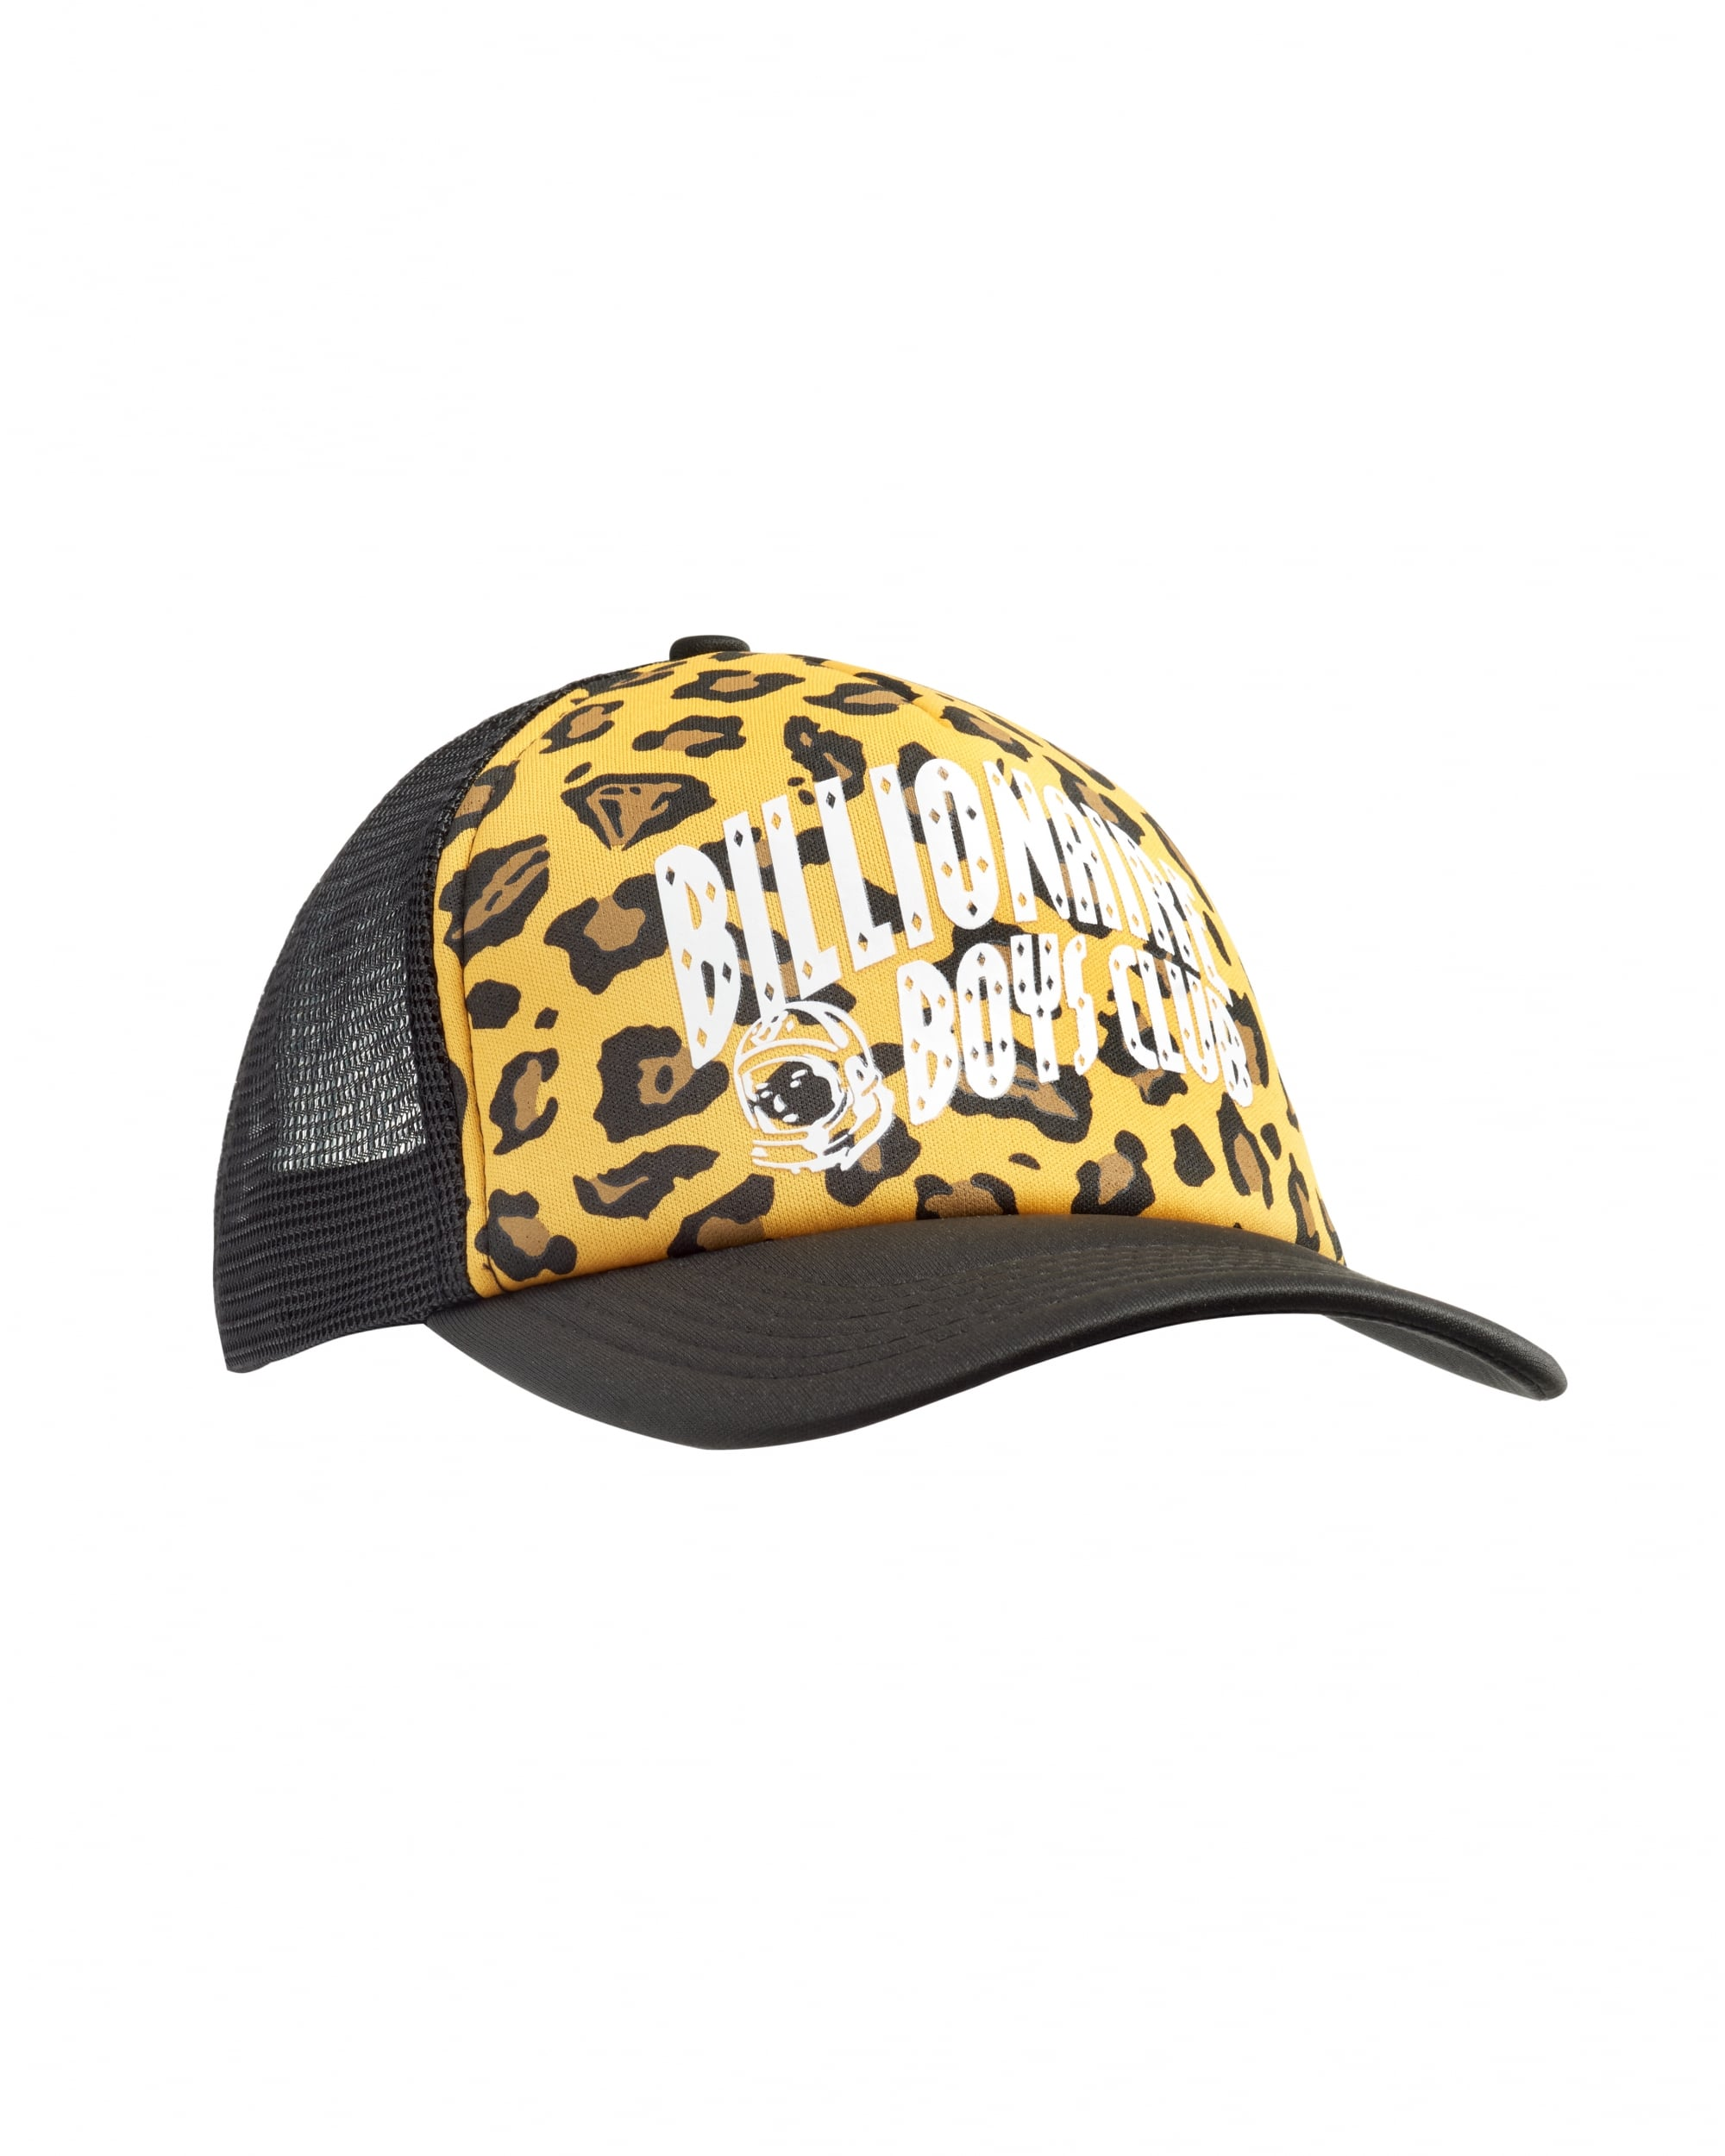 24340e53d39 usa billionaire boys club block snapback cap black e4daf fb358  denmark  mens leopard yellow print black trucker cap 1725c 73827